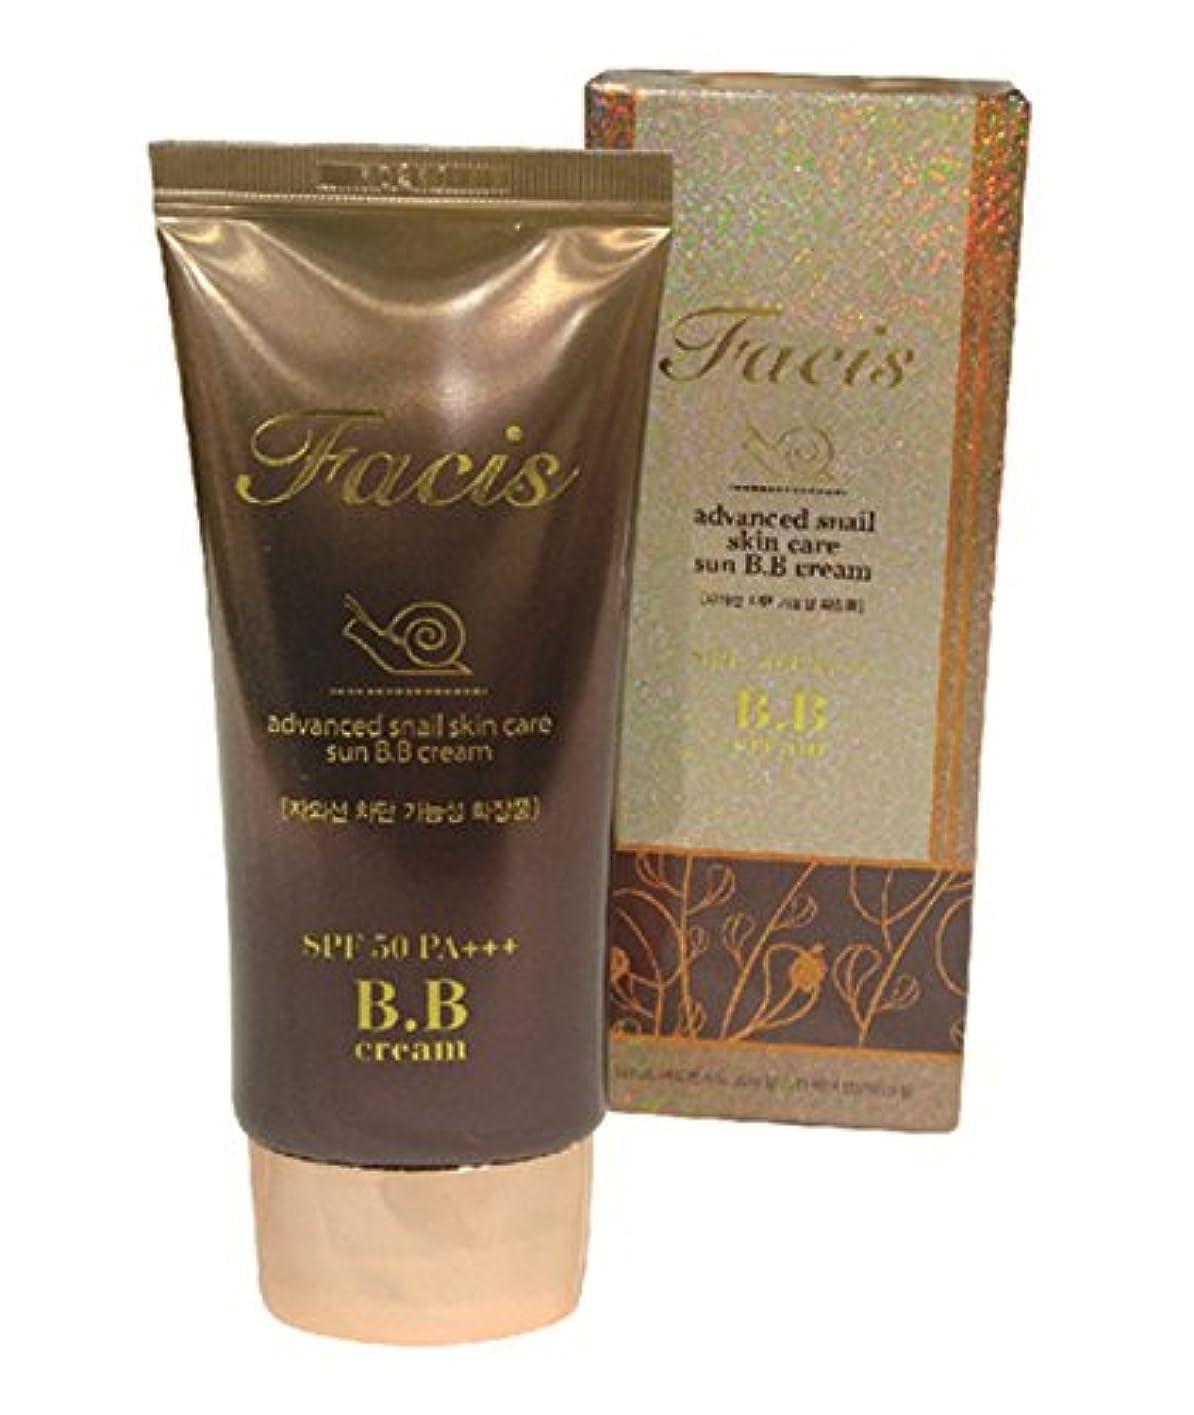 快適乱気流限りFacis Advanced Snail Skin Care Sun BB Cream 50ml CH1379619 [並行輸入品]